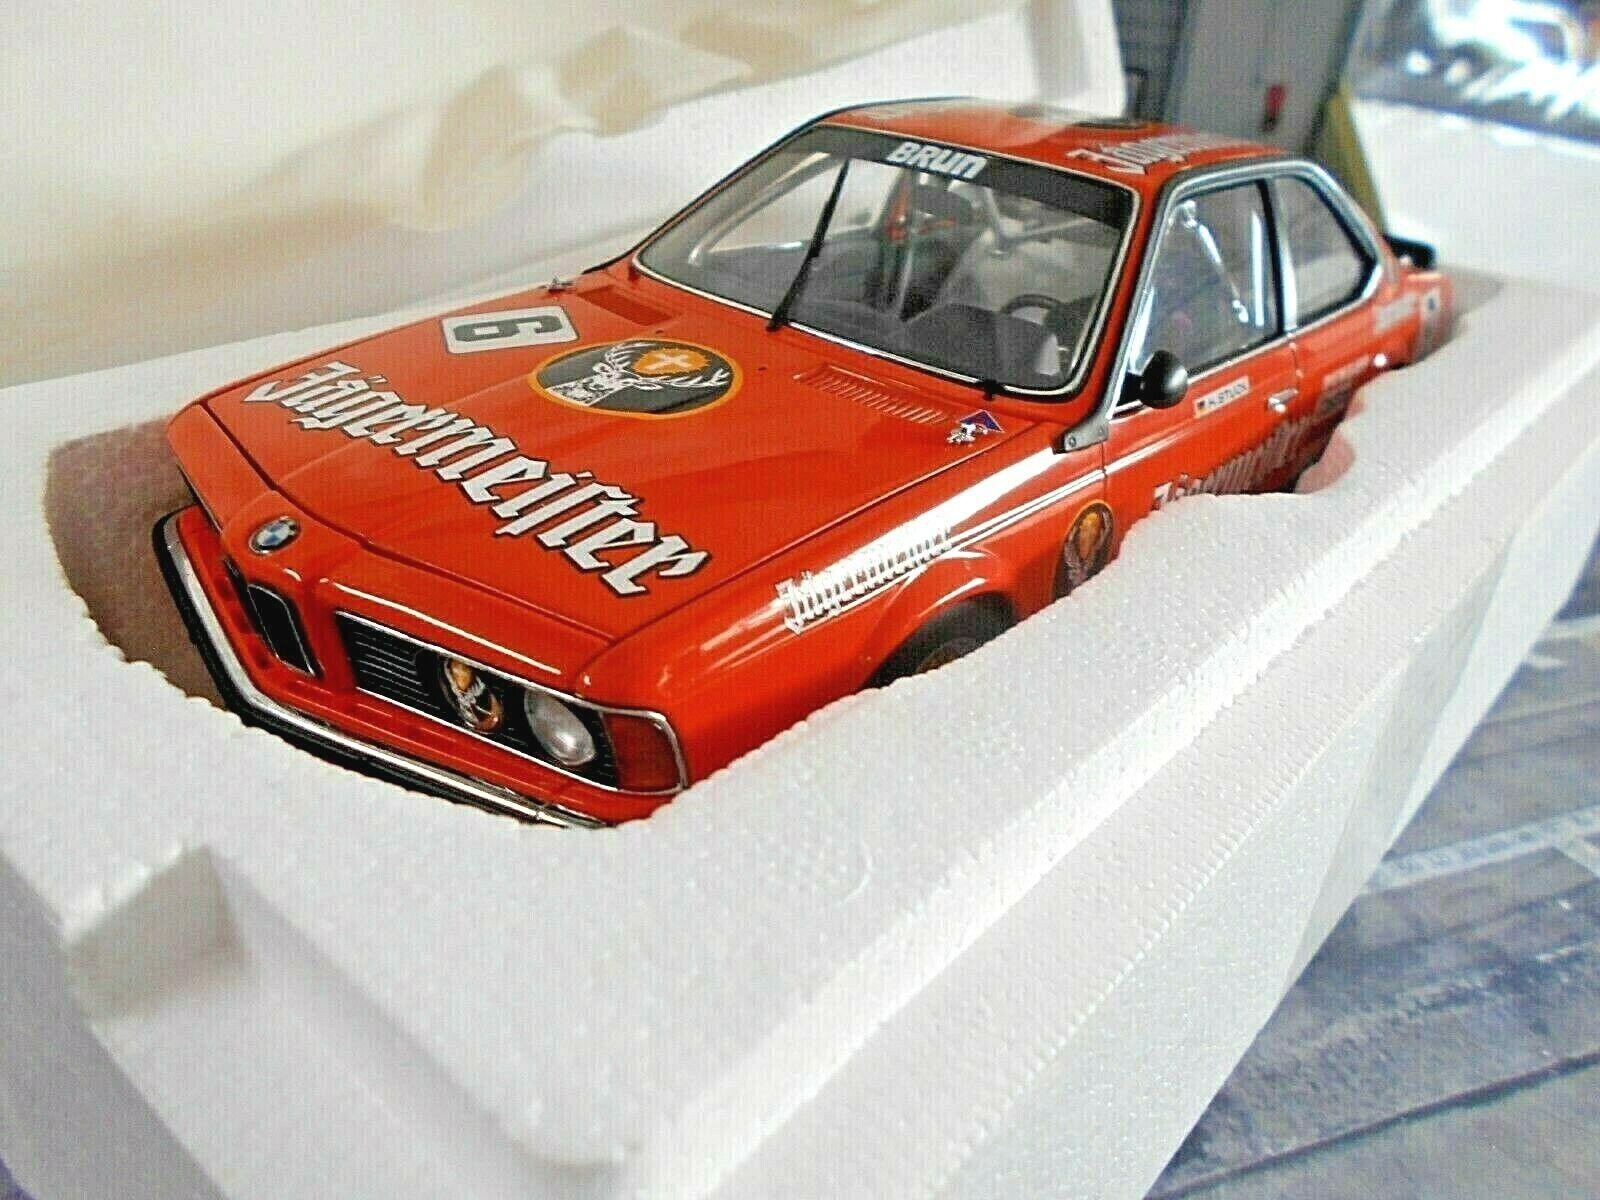 BMW 635 CSI e24 trajet voiture Jagermeister  6 stuc Brun 1984 TWEM Autoart 1 18